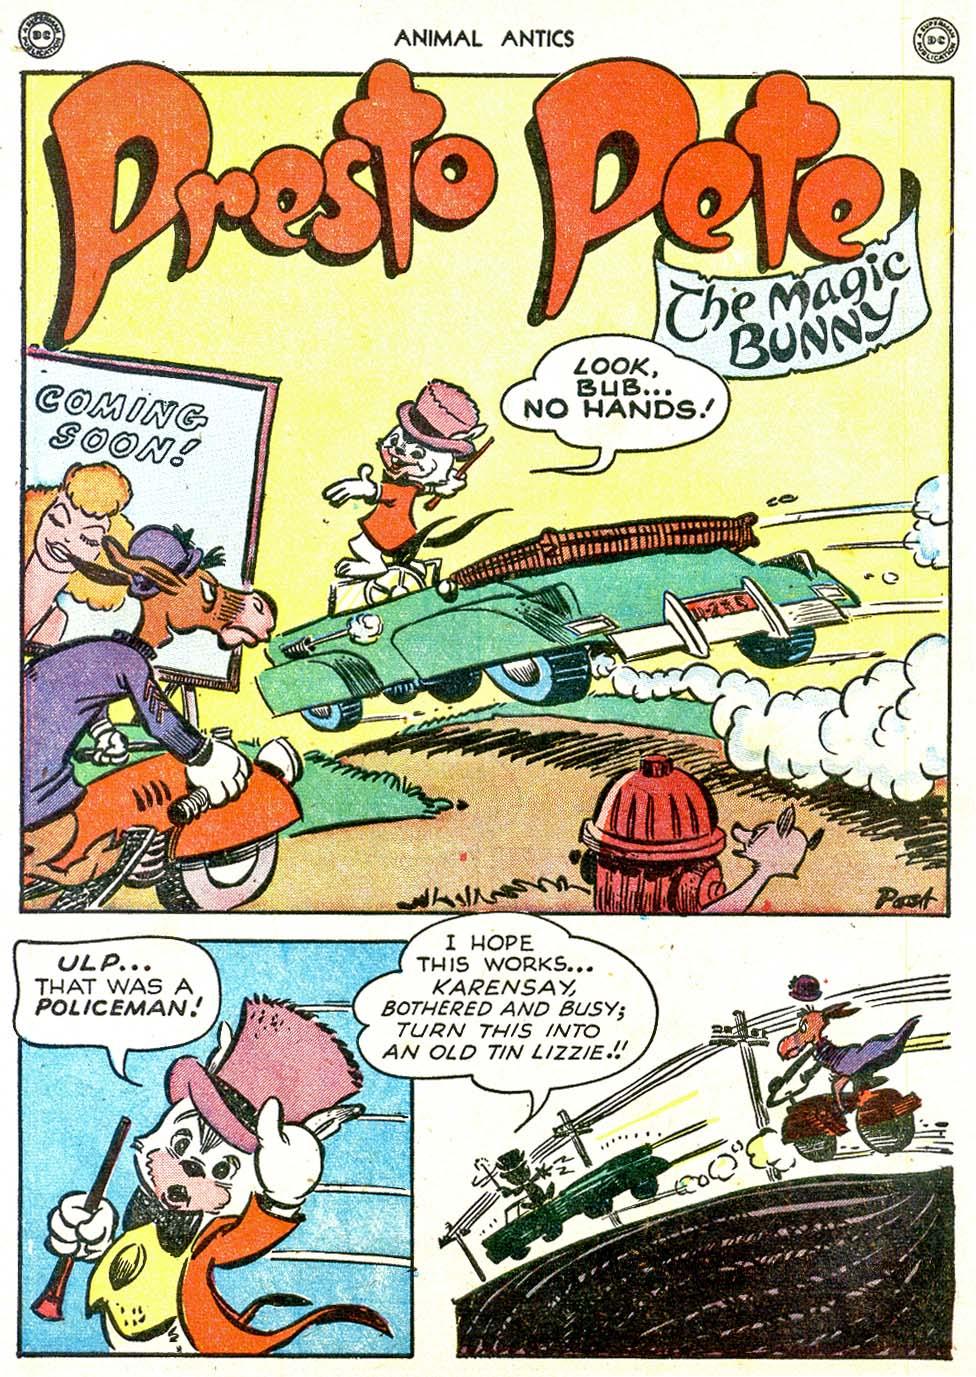 Read online Animal Antics comic -  Issue #11 - 42